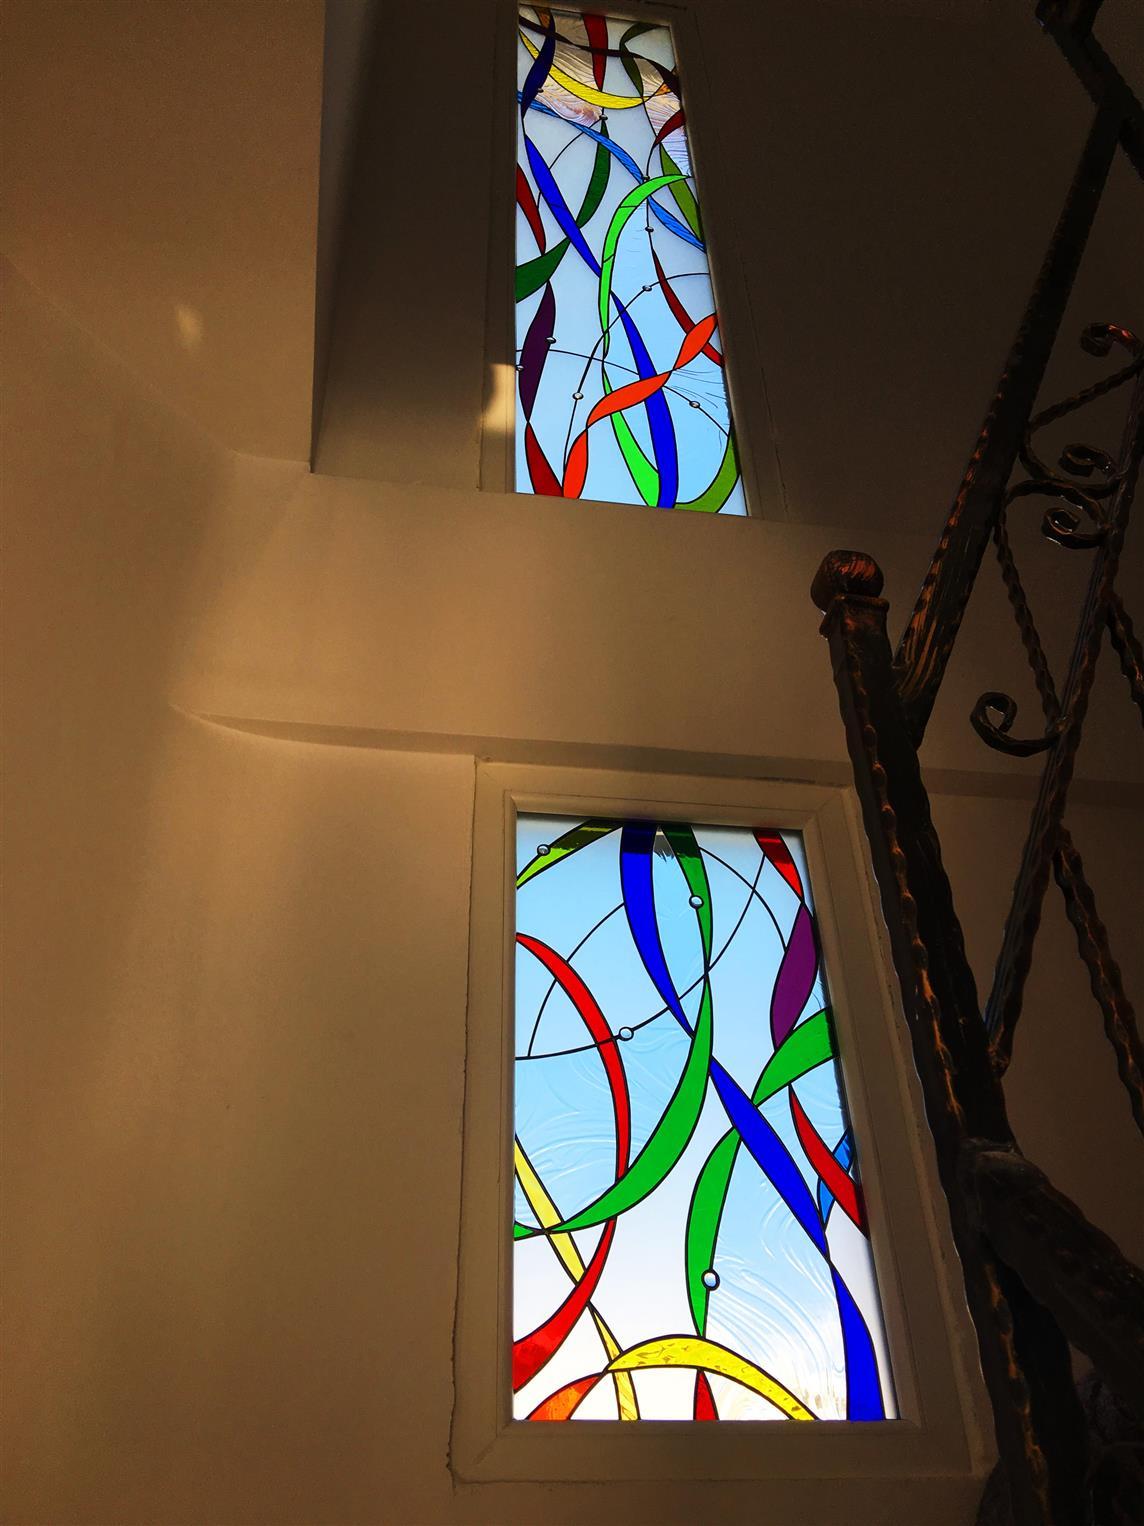 merdiven-cikisi-vitraylari20171221191644256.jpg izmir vitray çalışması